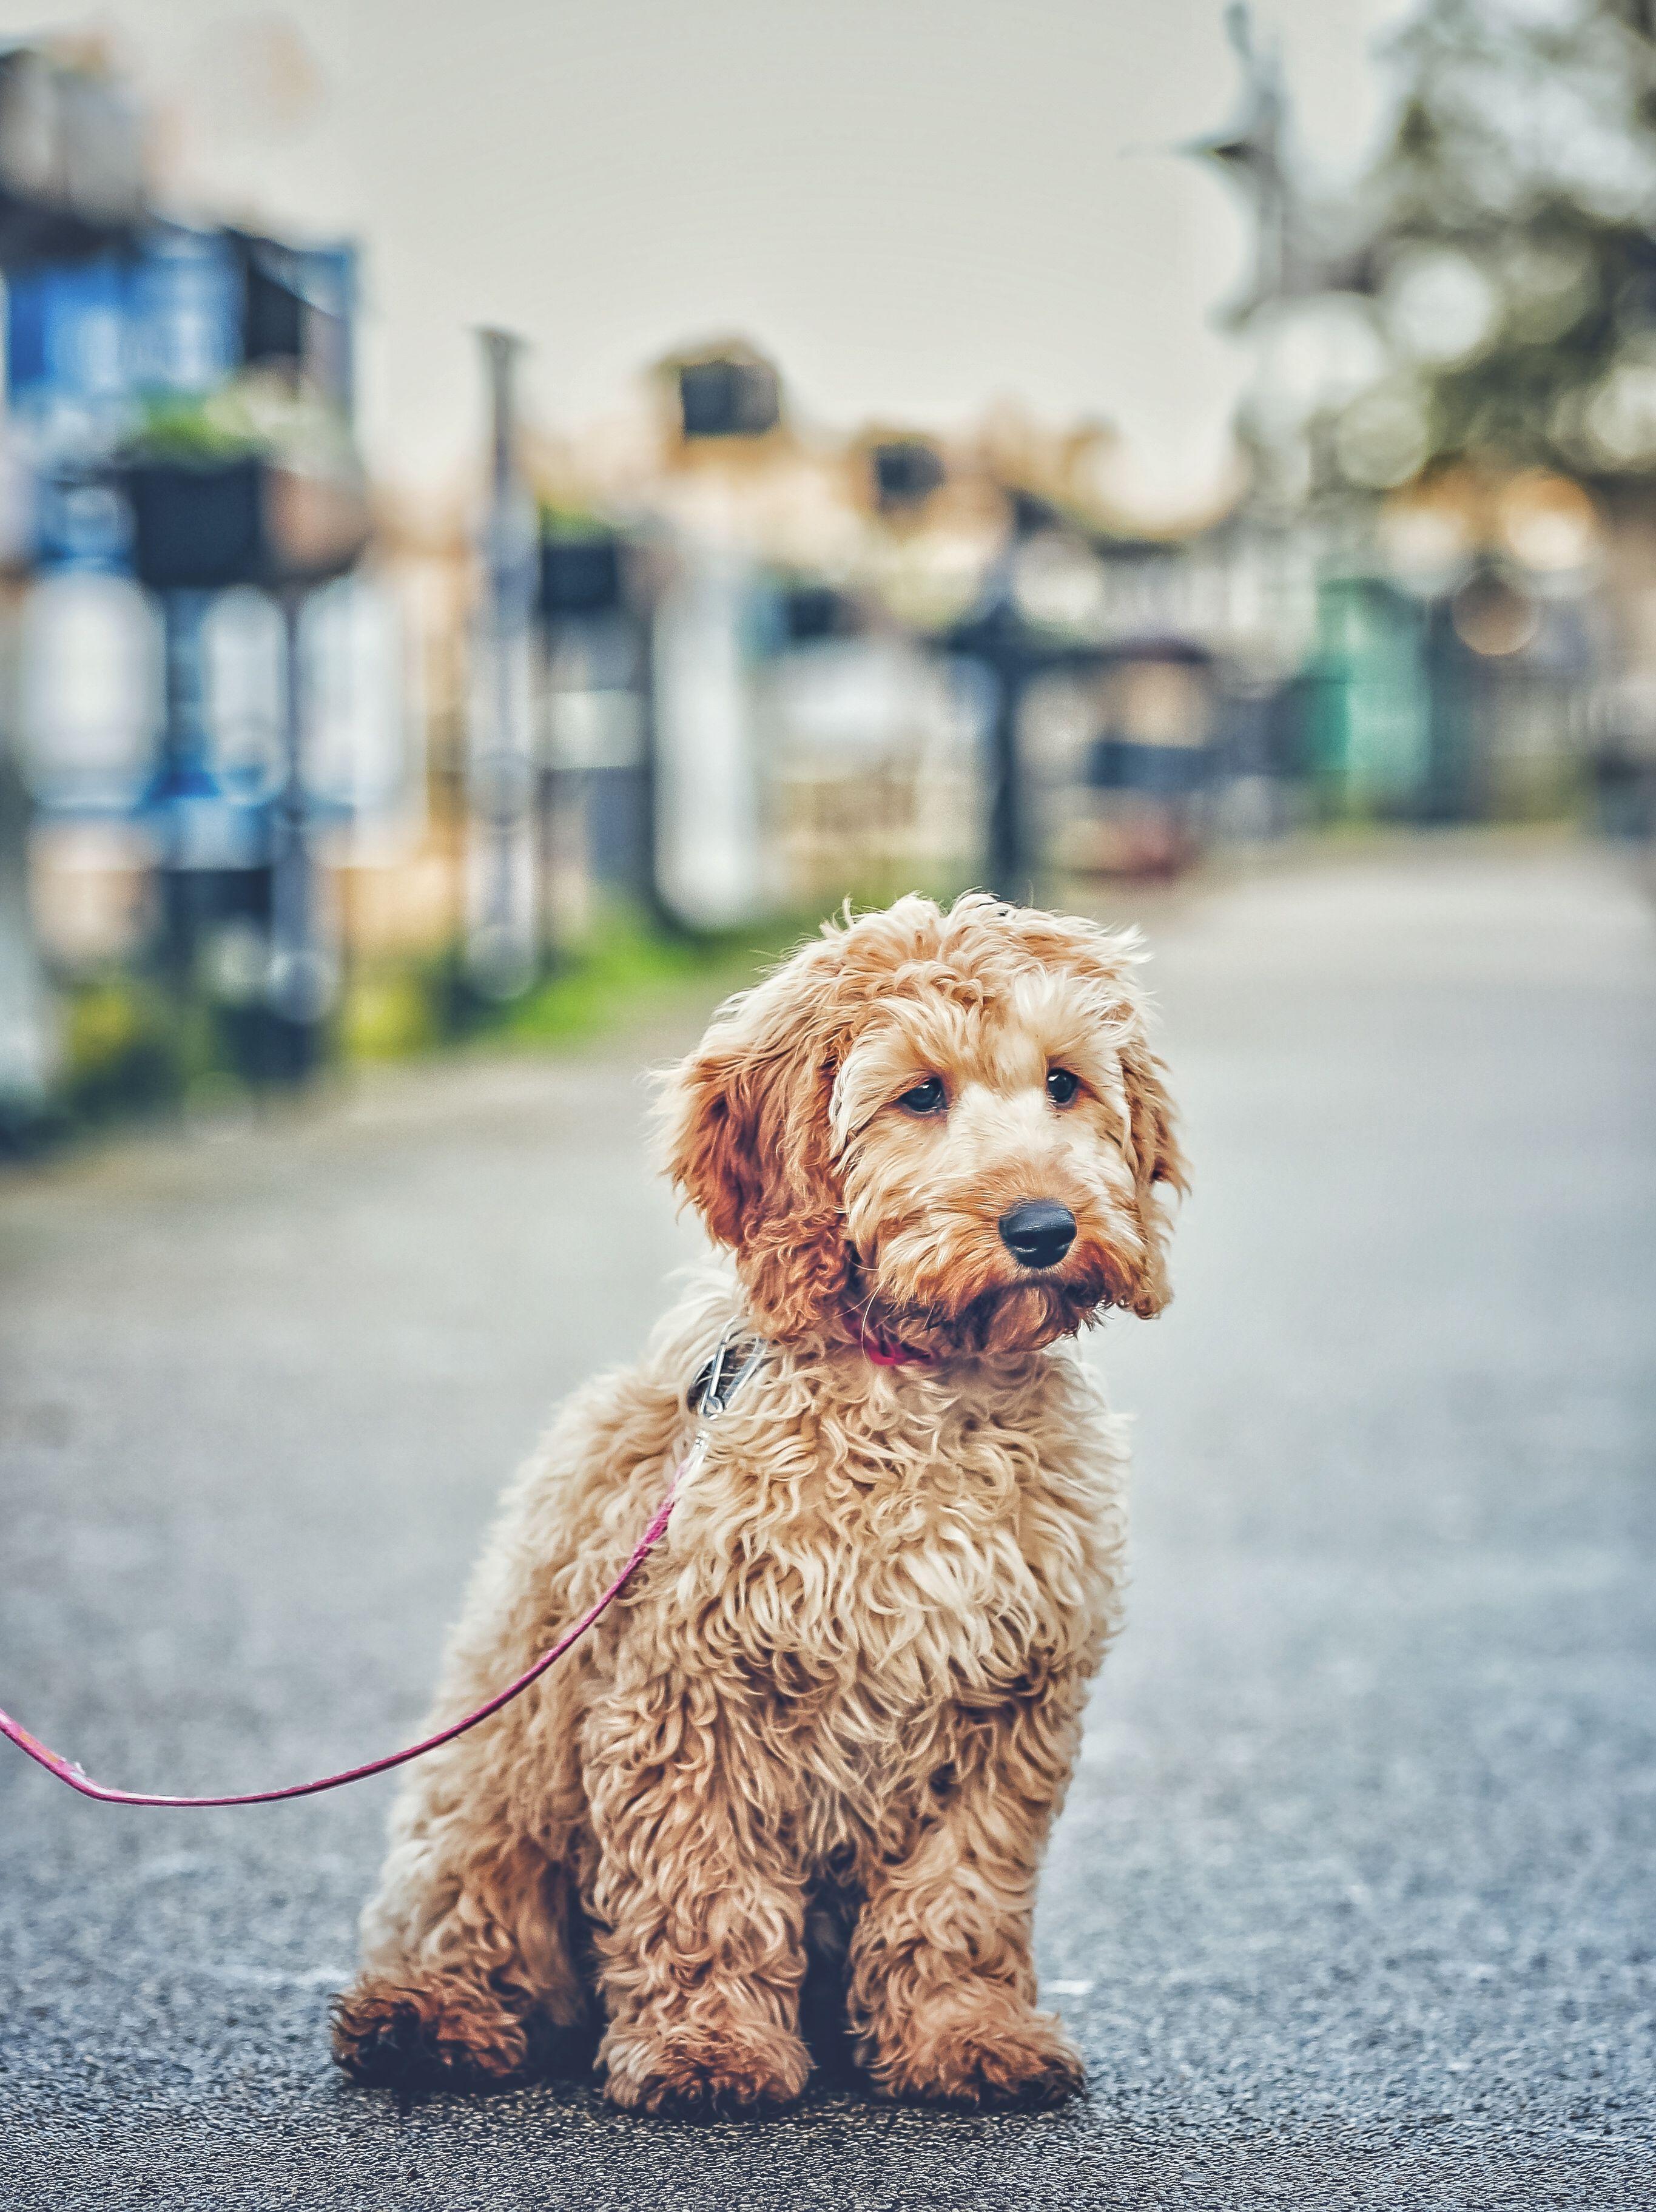 A cockapoo puppy cockapoo puppies pets dog photos